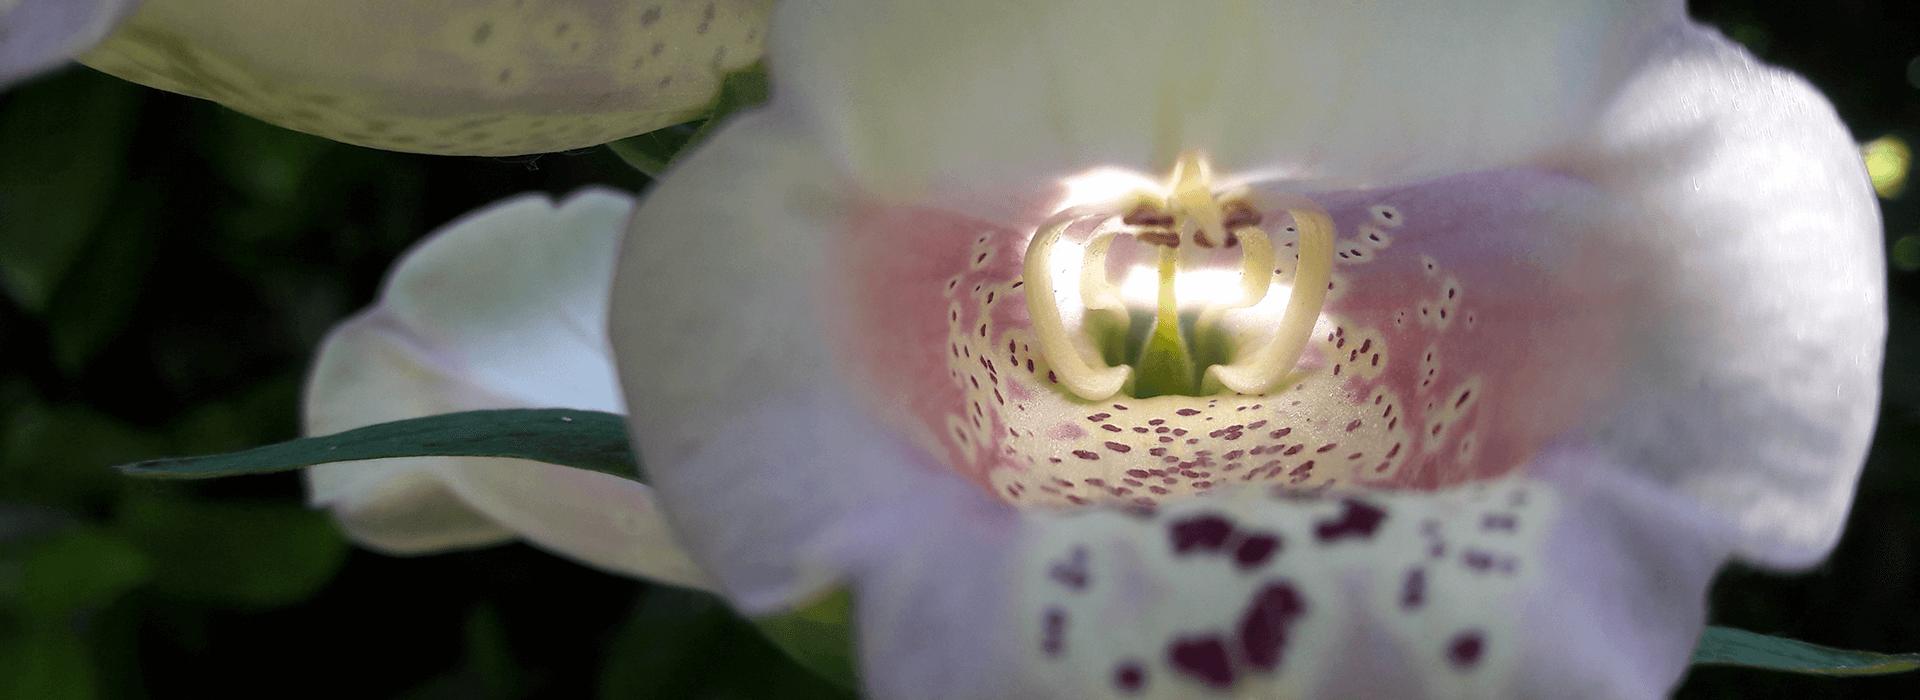 fleur-medicaments-douce-PHARMACIE (1)